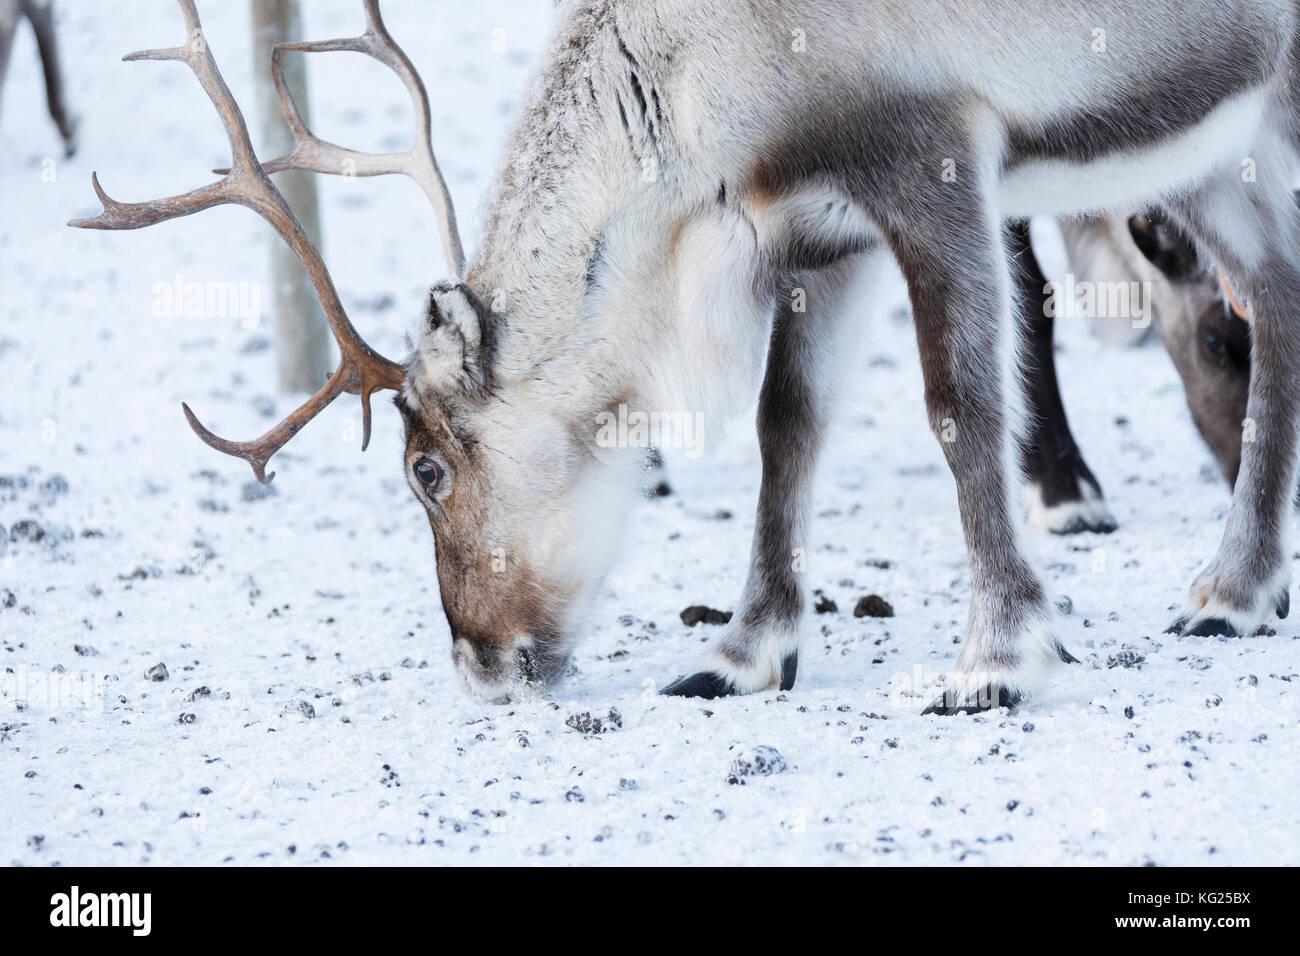 Close up of a reindeer, Abisko, Kiruna Municipality, Norrbotten County, Lapland, Sweden, Scandinavia, Europe - Stock Image